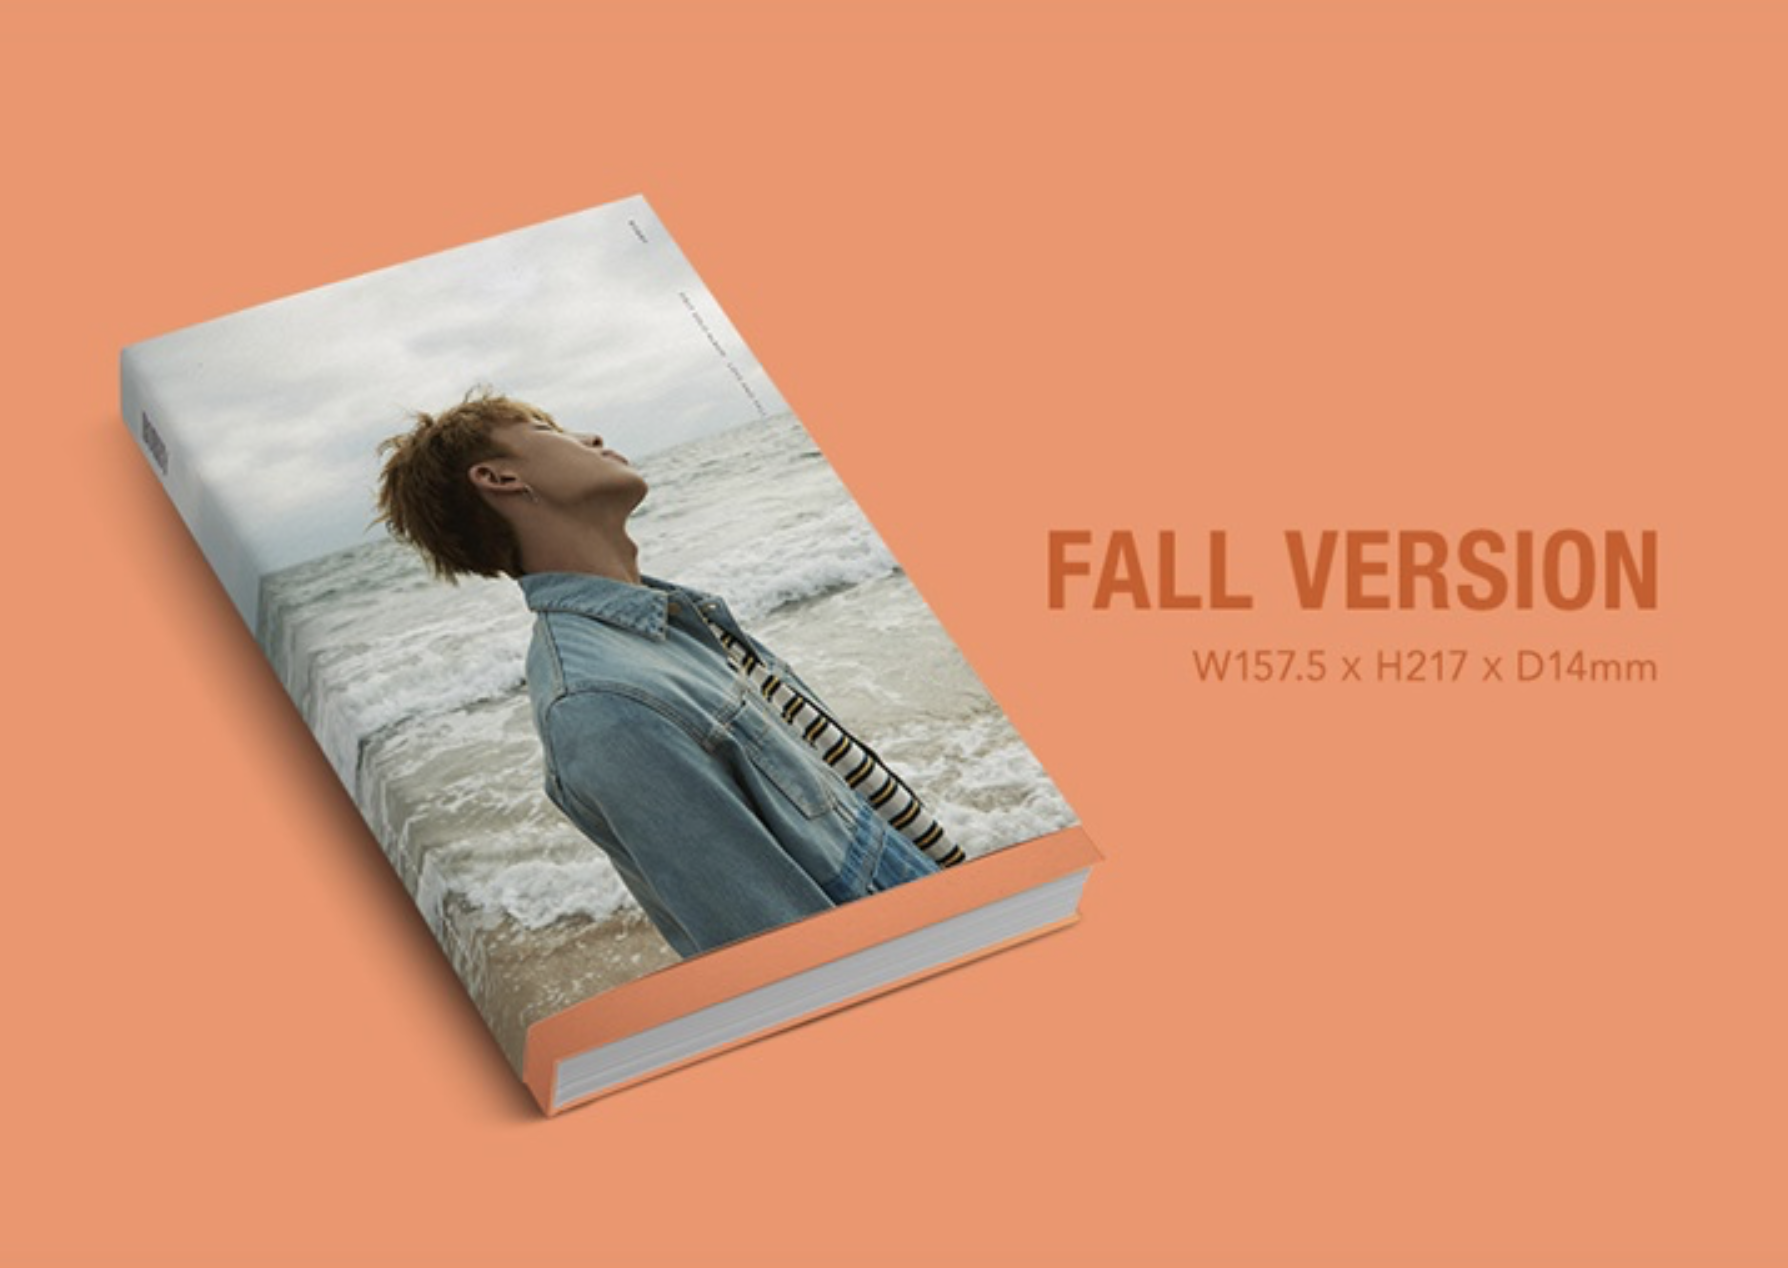 iKON : BOBBY - SOLO ALBUM VOL.1 [LOVE AND FALL] หน้าปก FALL ver